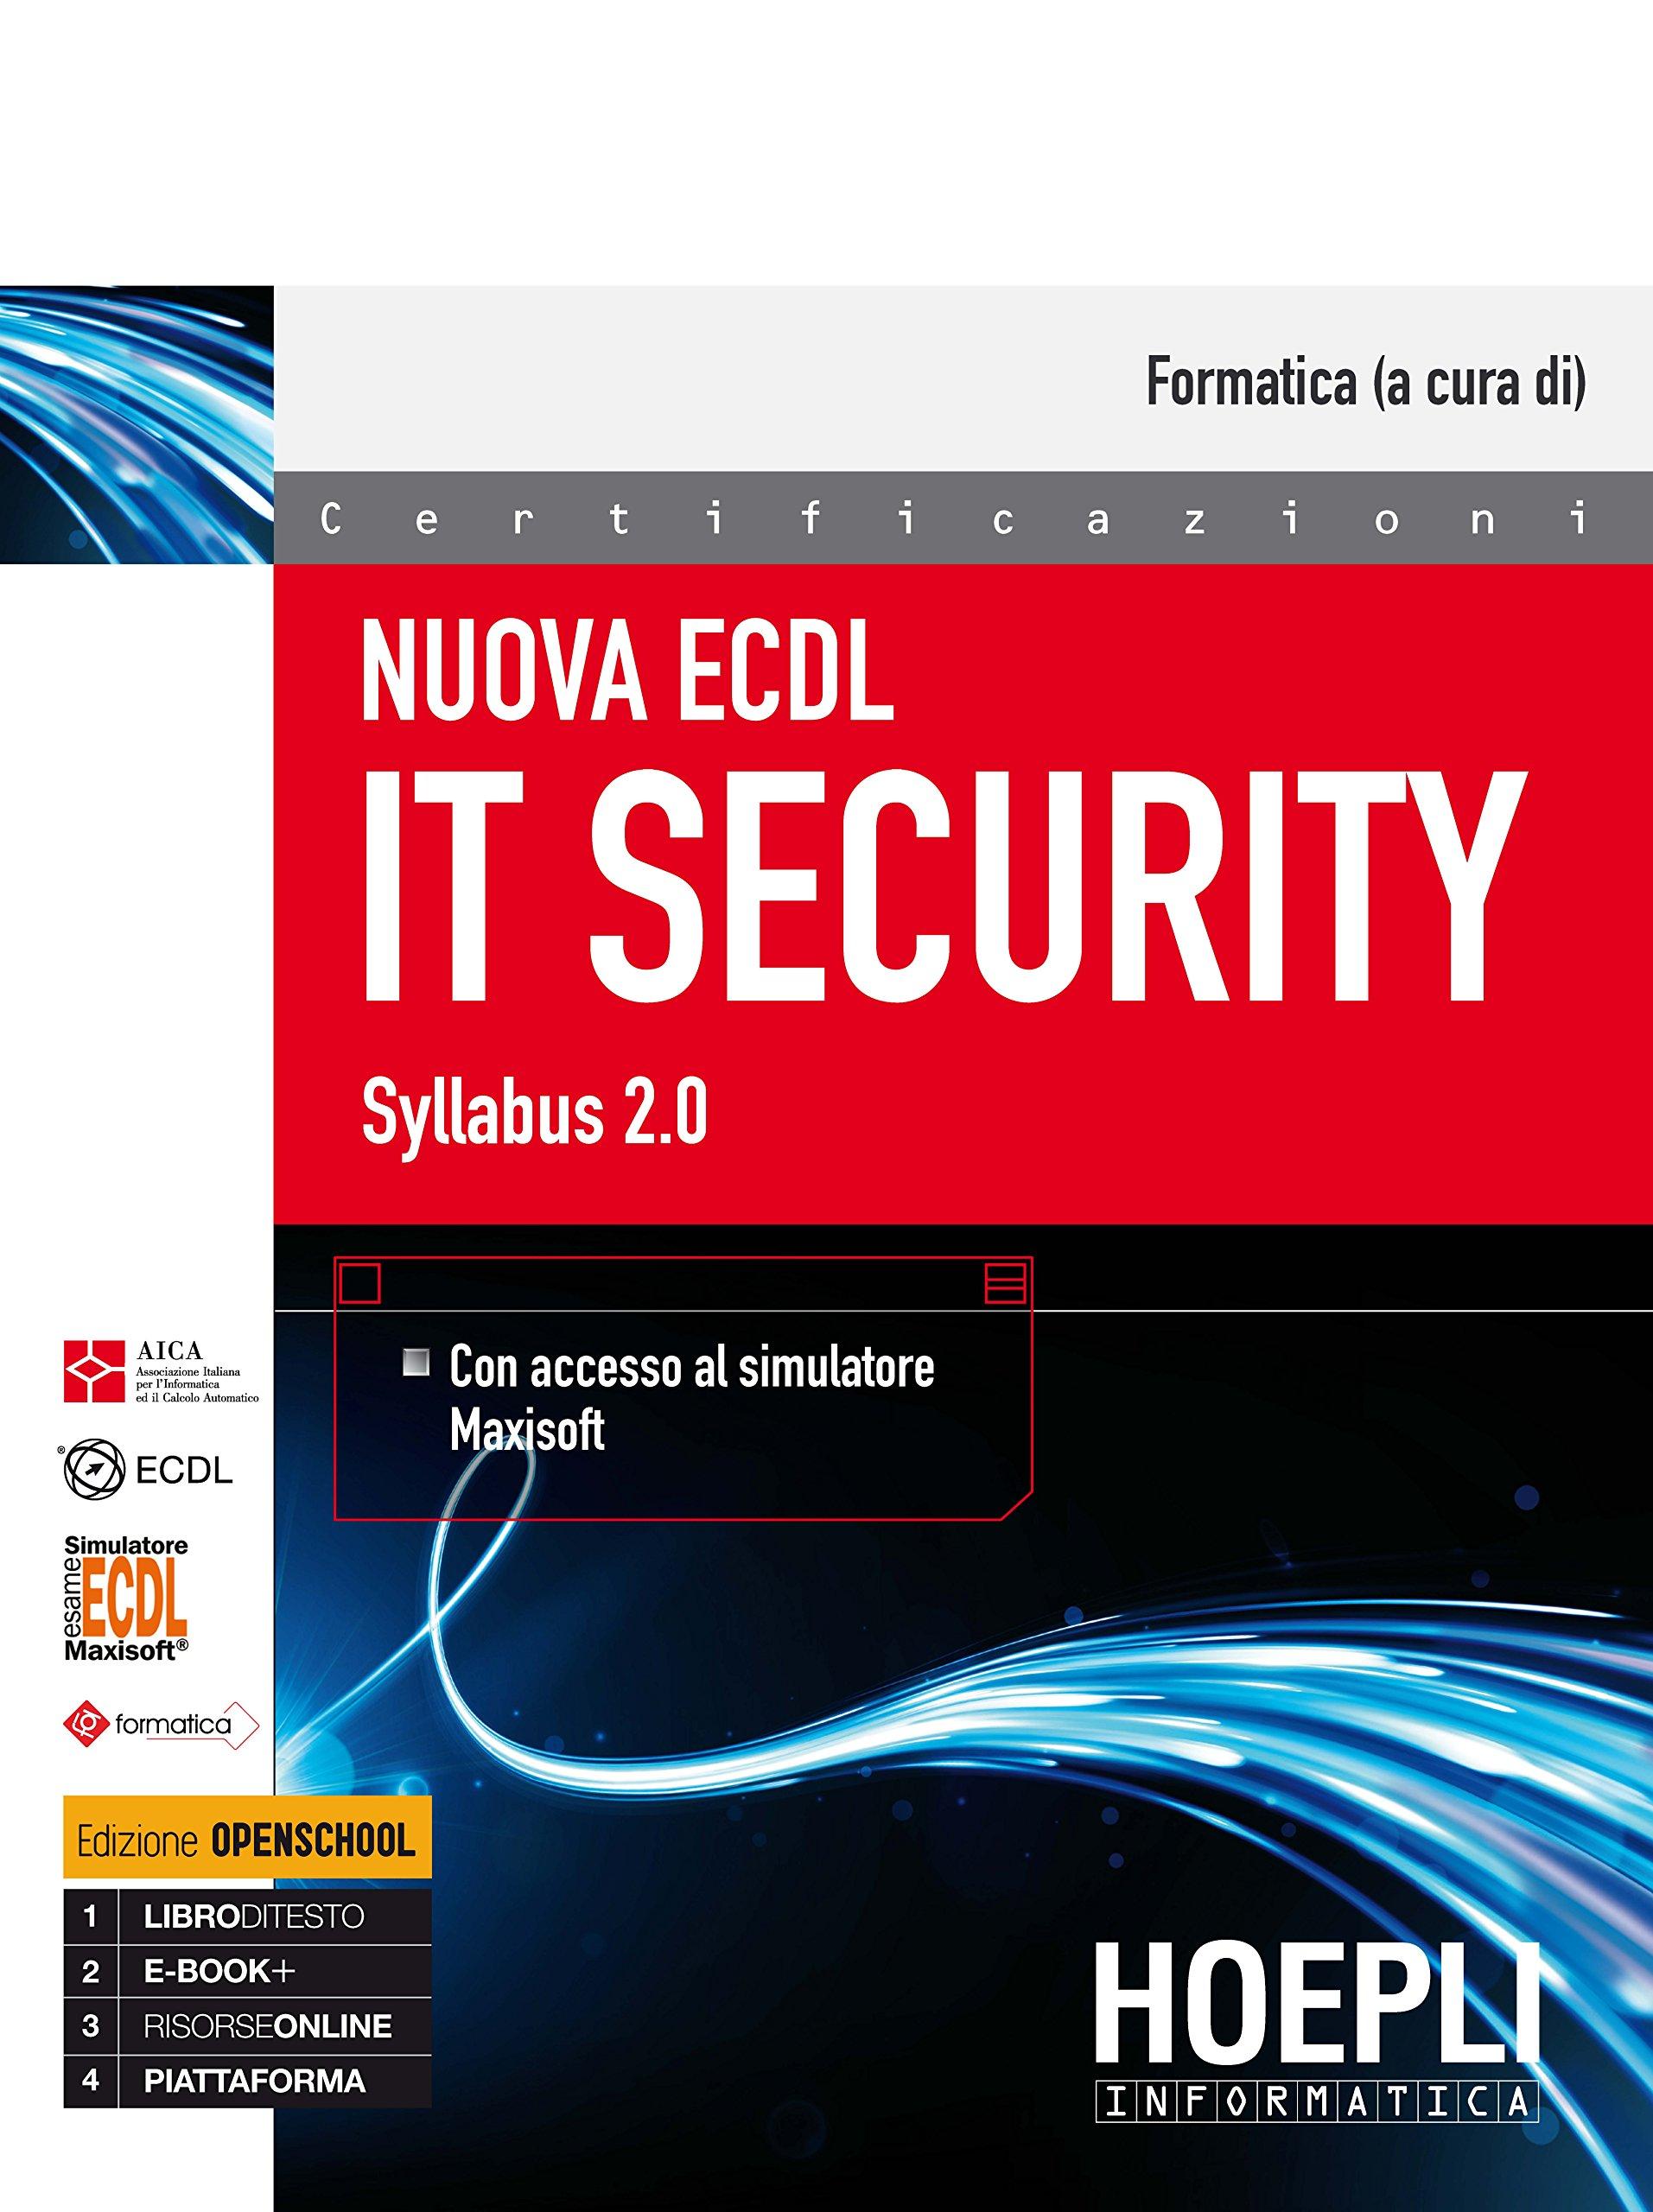 Nuova ECDL IT security. Syllabus 2.0 Copertina flessibile – 27 ott 2017 Formatica Hoepli 8820382245 Informatica